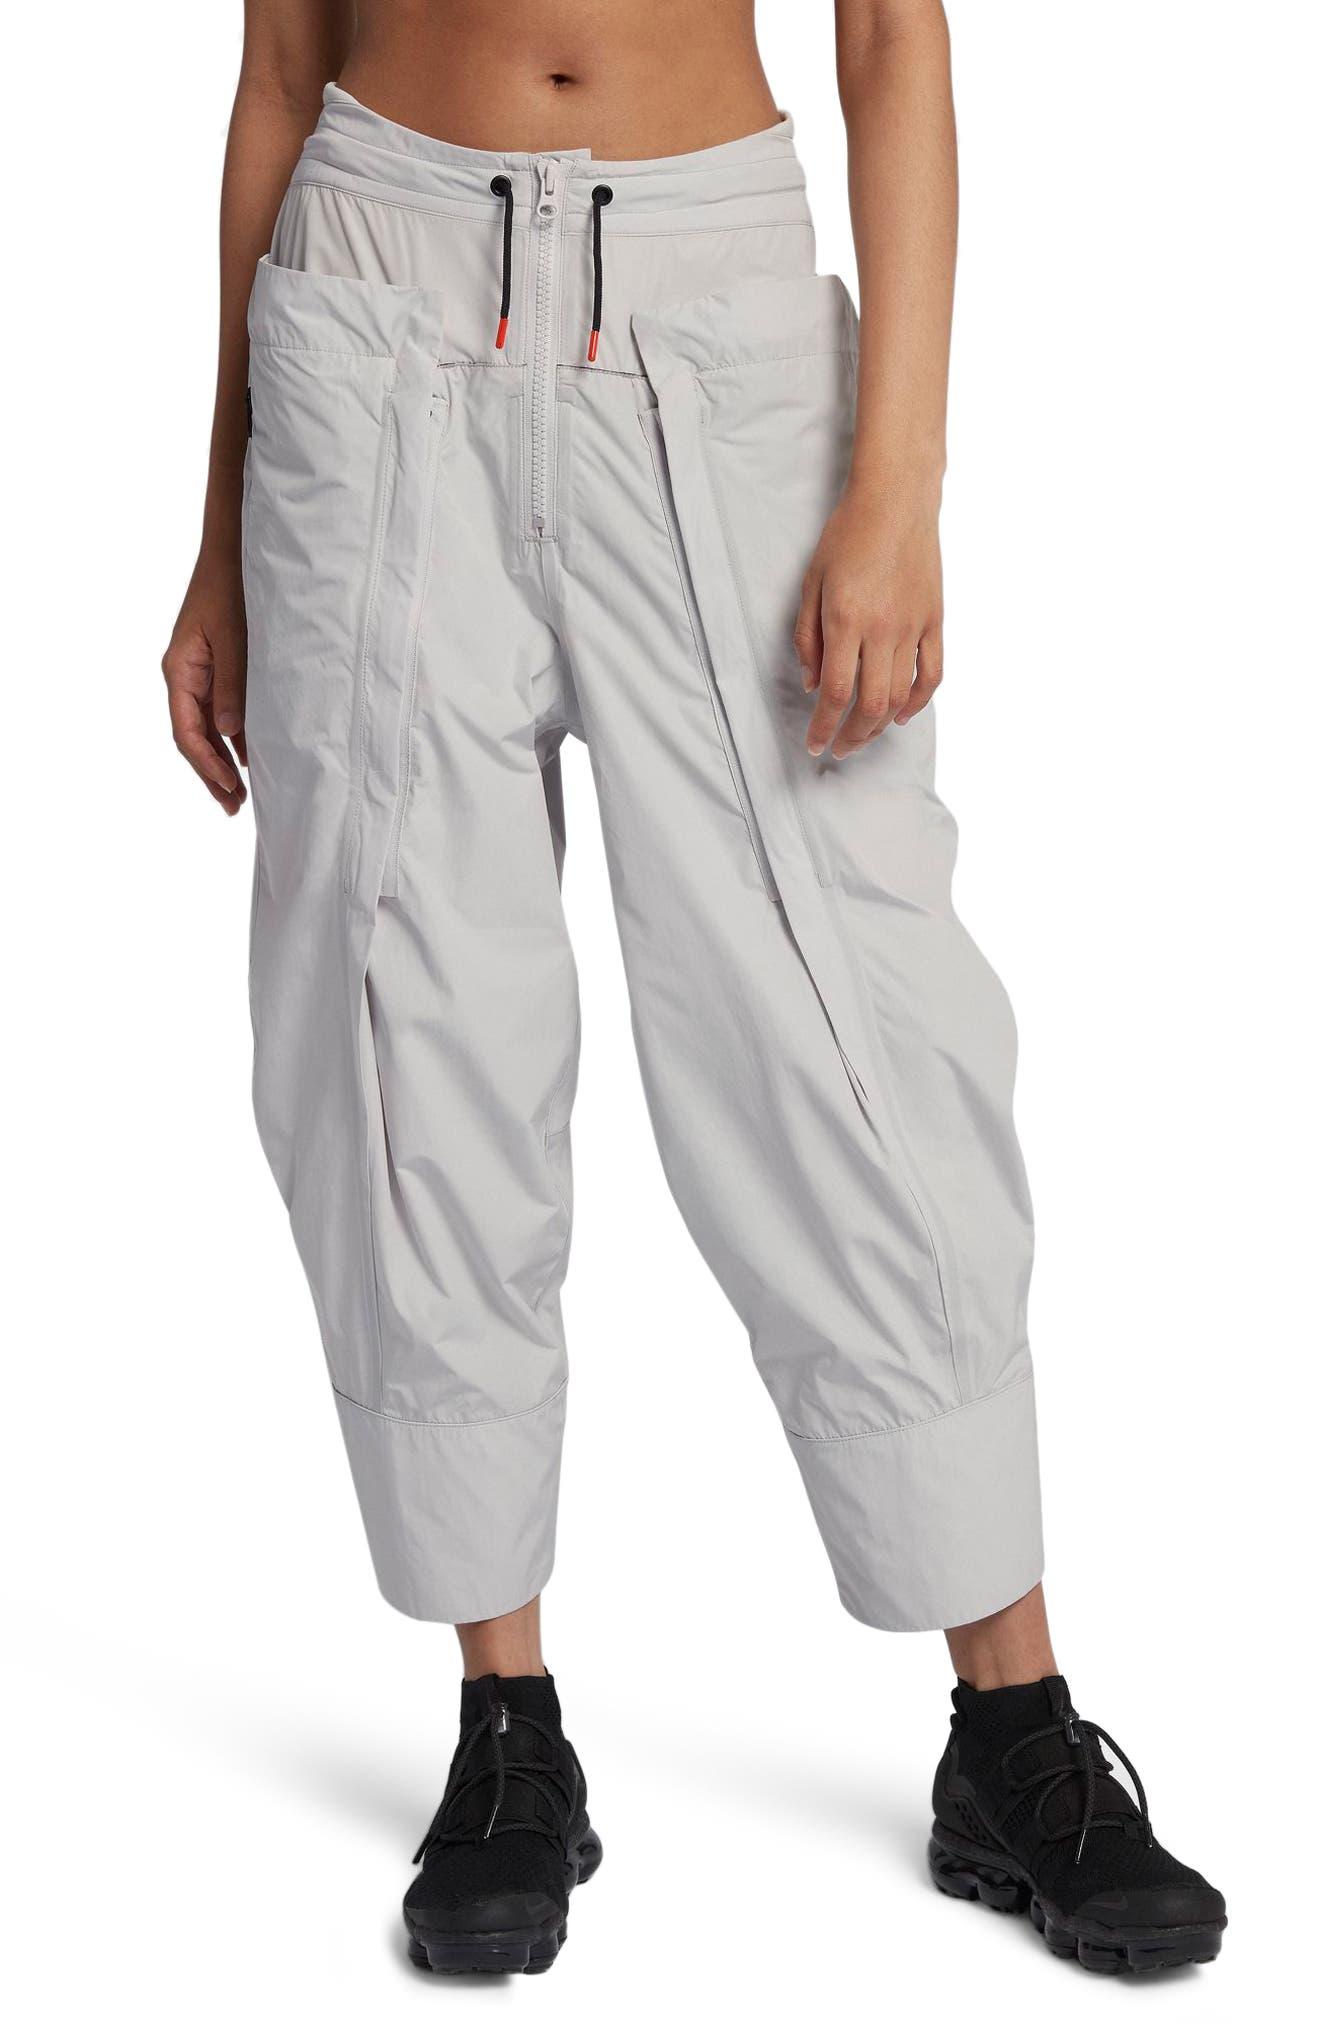 NikeLab ACG Women's Cargo Pants,                         Main,                         color, Vast Grey